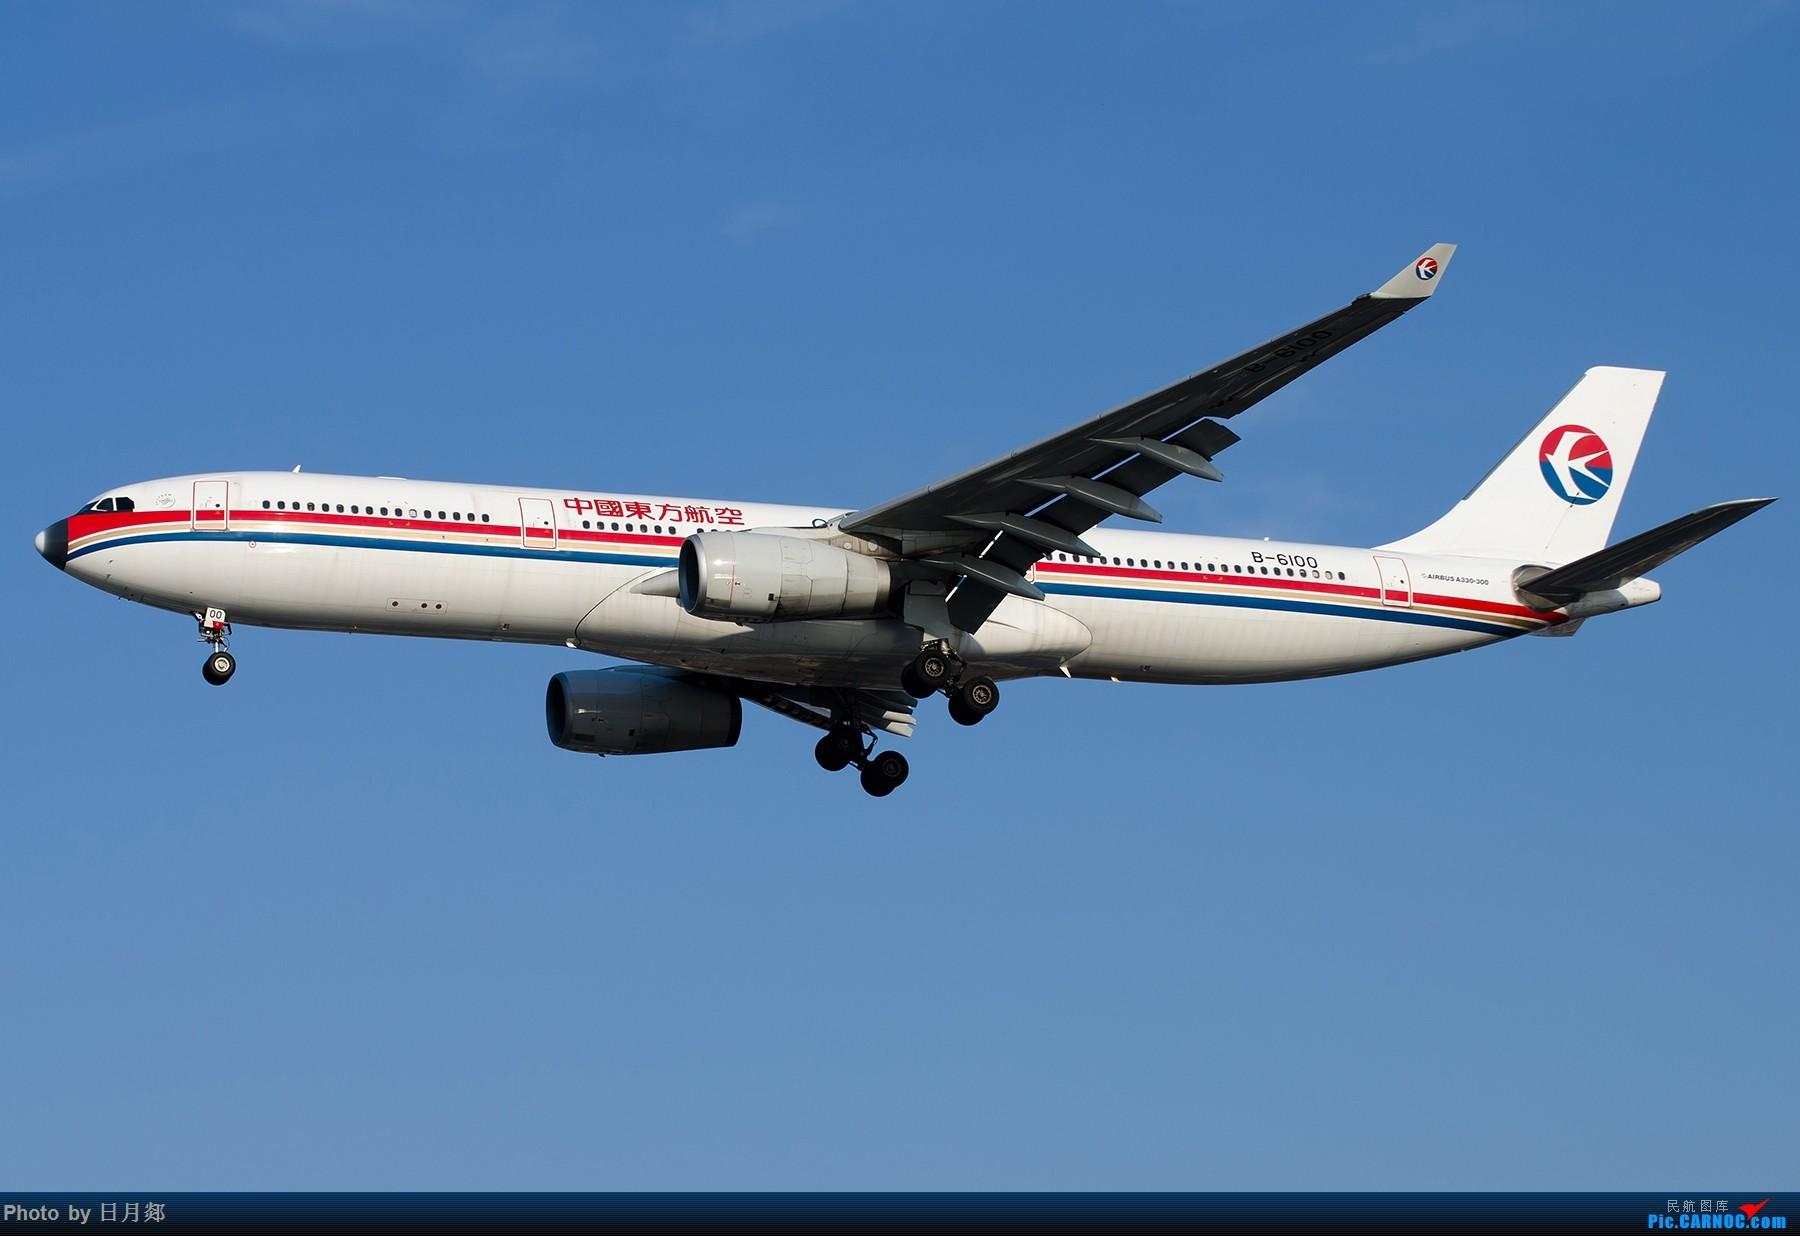 Re:[原创]【SHA拍机*1800大图】轻度污染来临前宝贵的蓝天,且拍且珍惜 AIRBUS A330-300 B-6100 中国上海虹桥国际机场